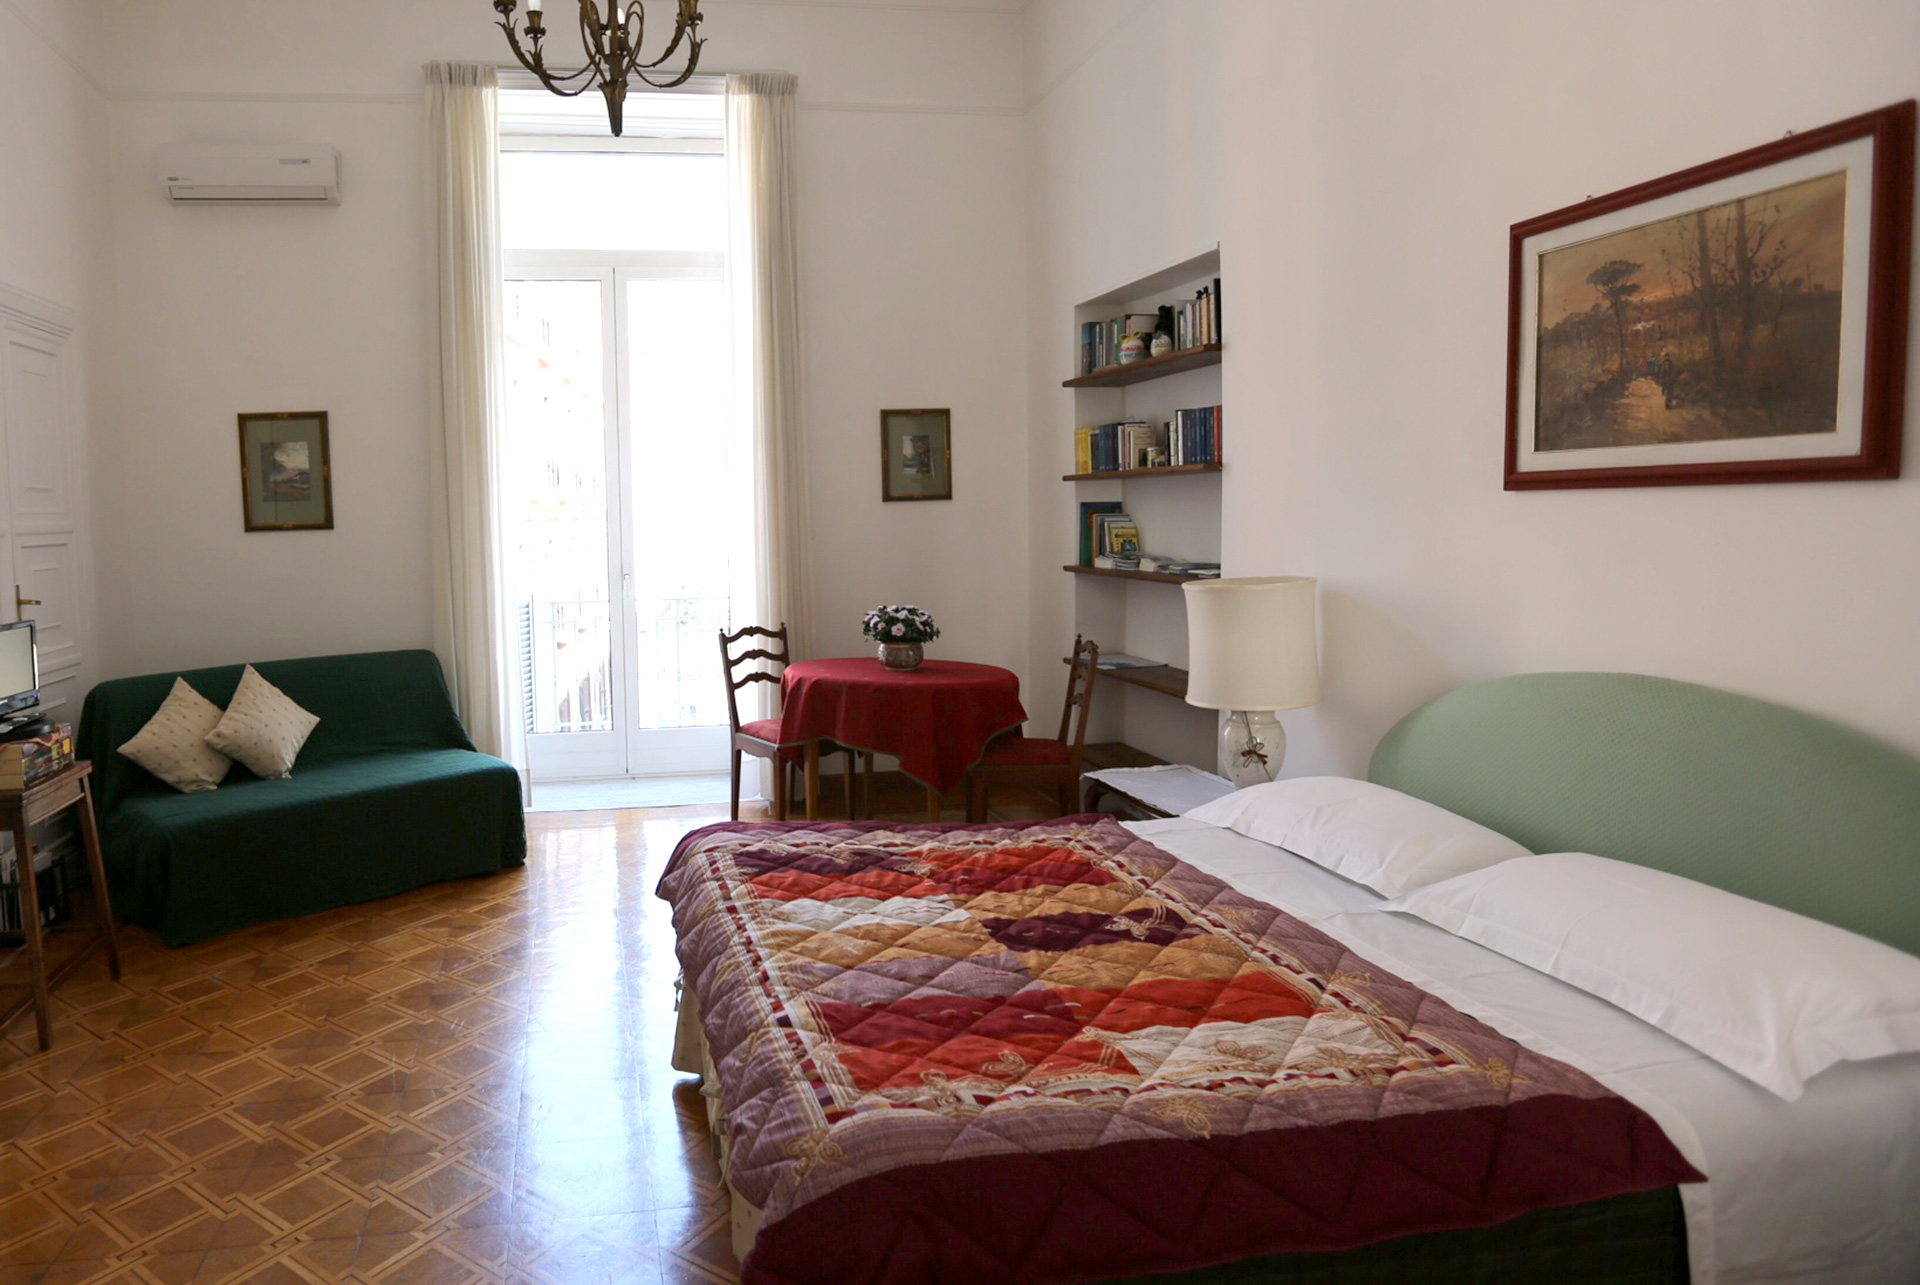 http://asantabrigida.com/it/wp-content/uploads/2014/04/Foto-camera-bed-breakfast-napoli-centro1.jpg